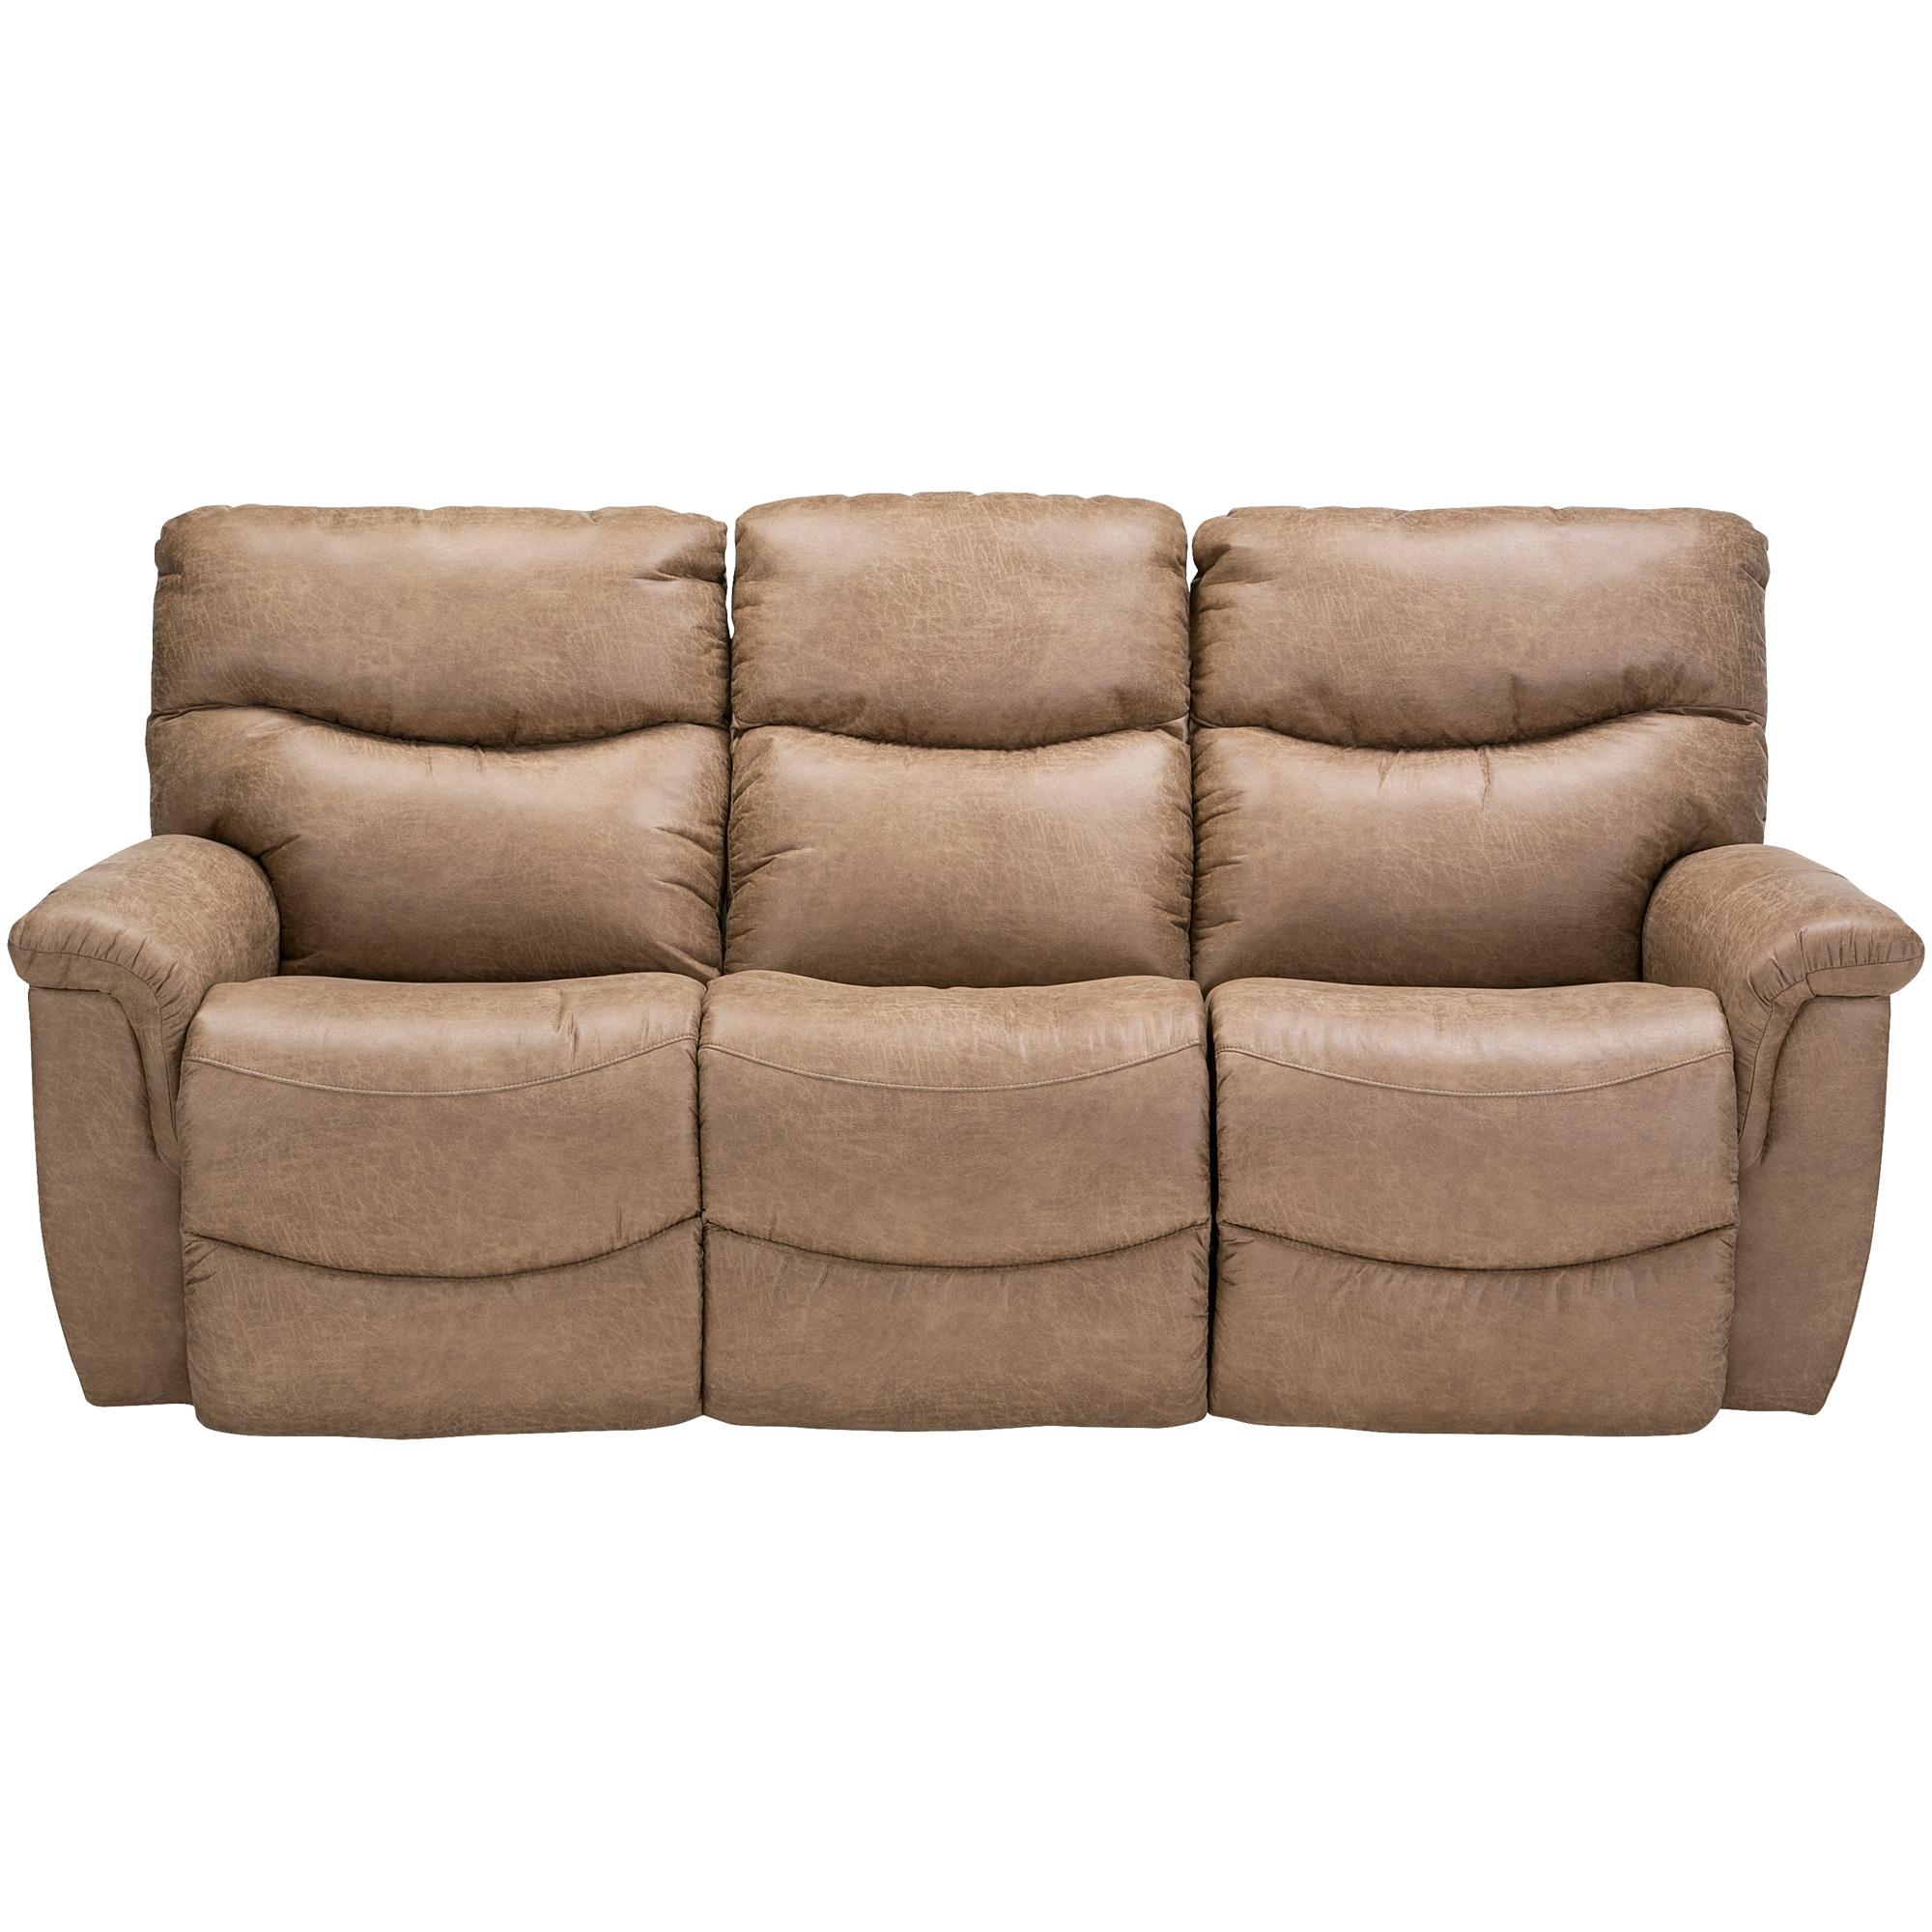 slumberland sofa recliners corner bed uk argos james power lazy boy taraba home review